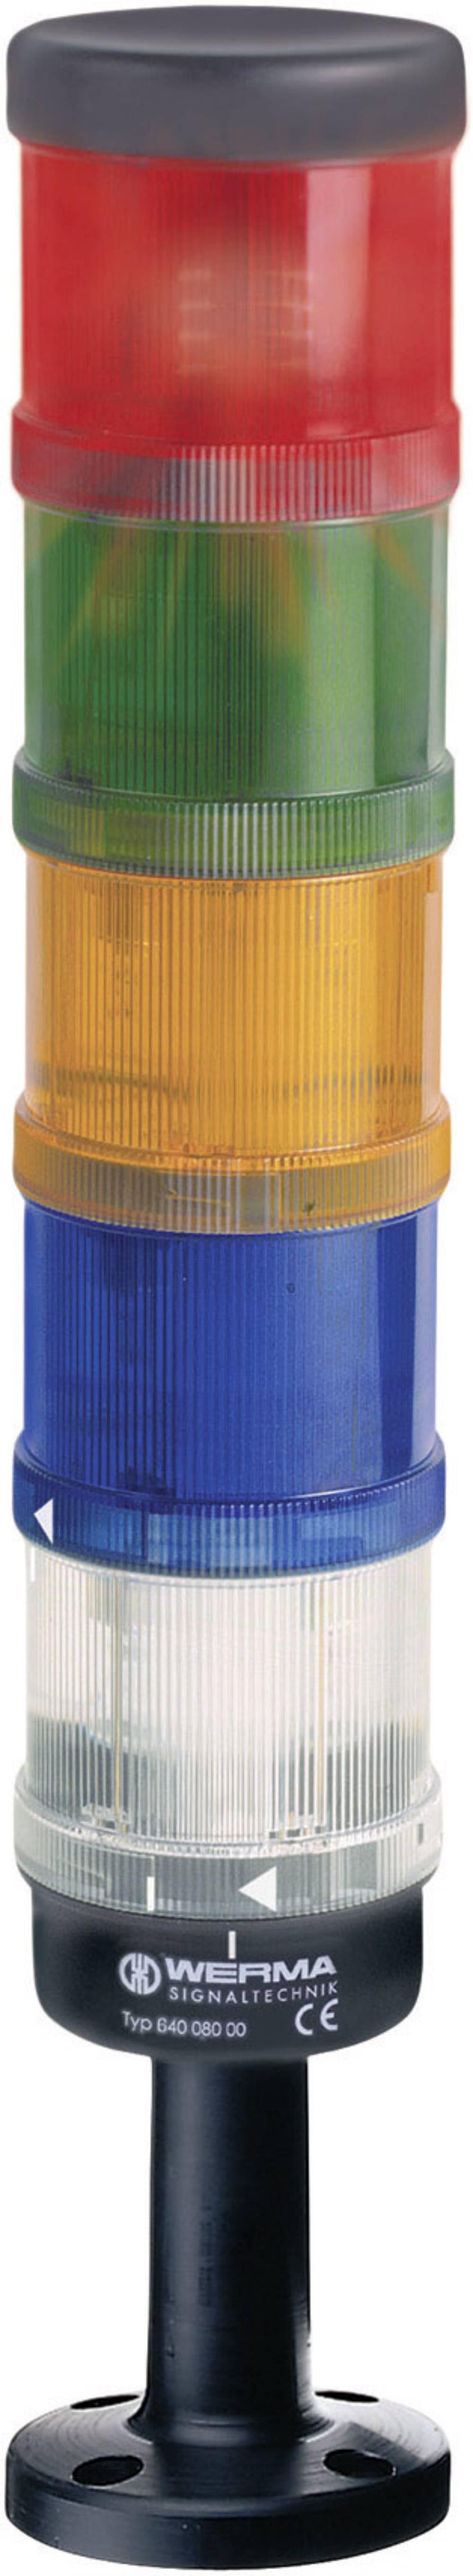 LED trajna svjetiljka plava 24V za KOMdoIGN71 Werma Signaltechnik 644.500.75